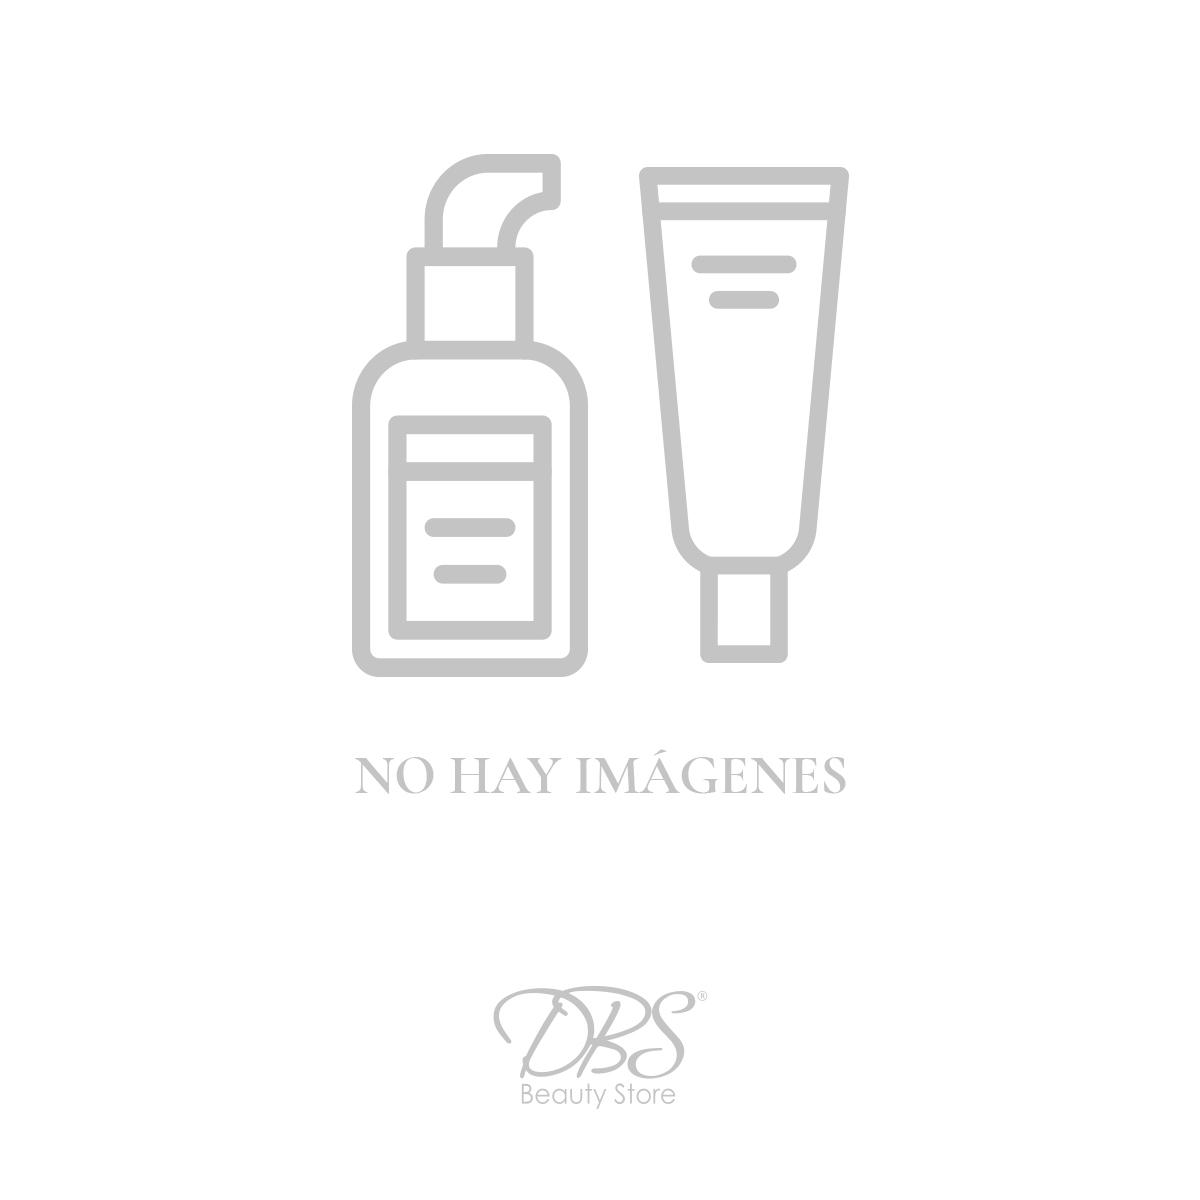 dbs-cosmetics-DBS-YH1032-MP.jpg